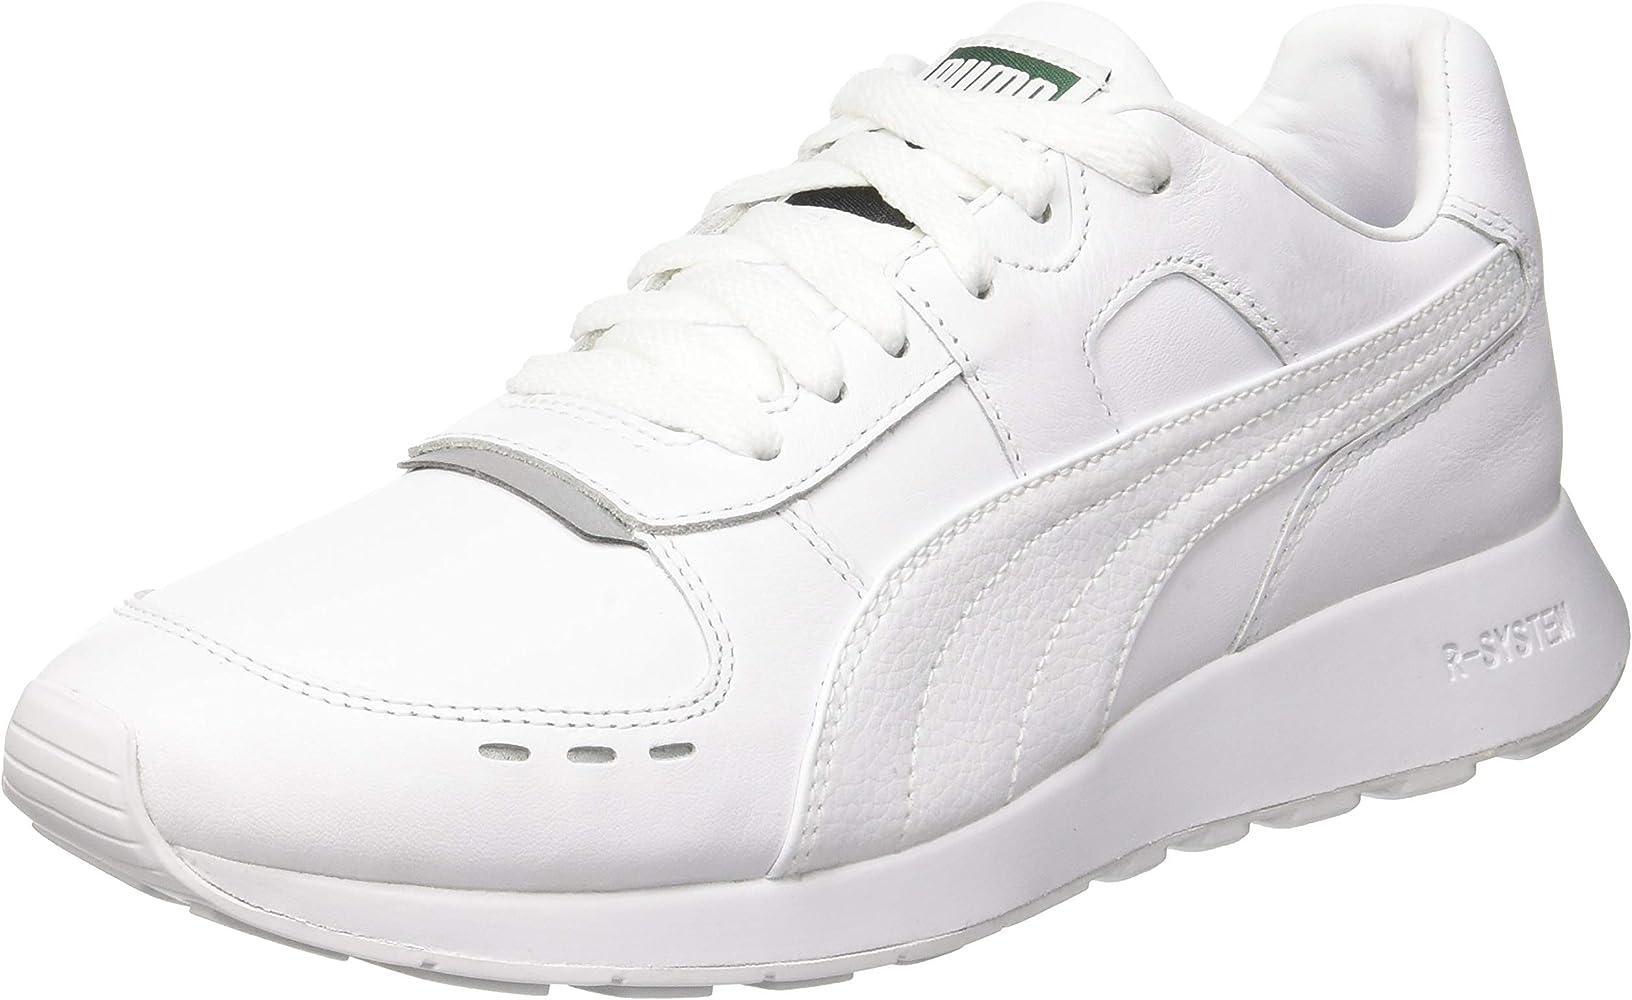 Puma Rs 150 Wn's, Baskets Basses Femme Blanc (White 01) 36.5